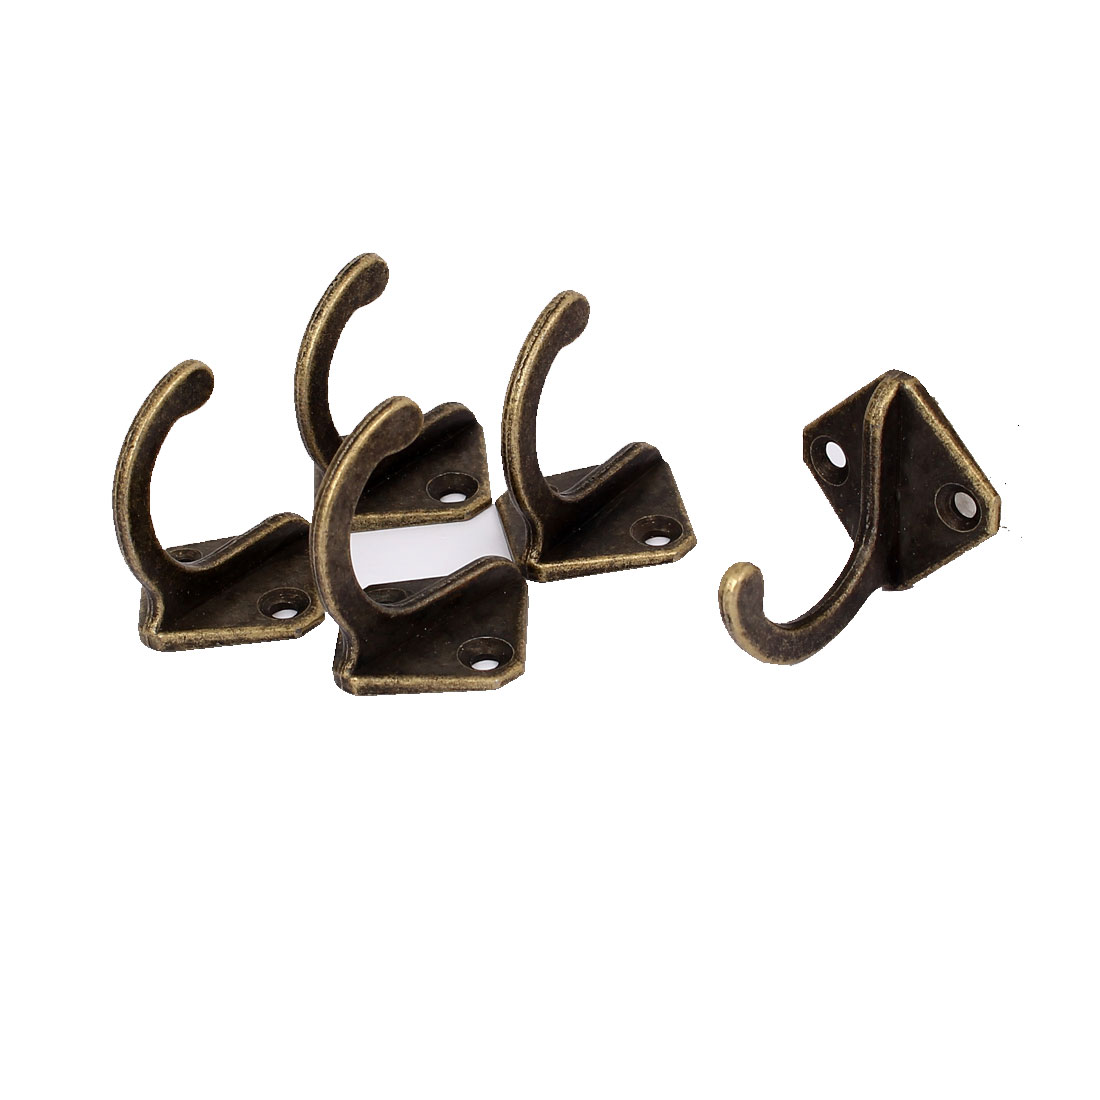 28mm x 28mm Robe Hat Coat Wall Hanging Hook Single Prong Hanger Bronze Tone 5PCS